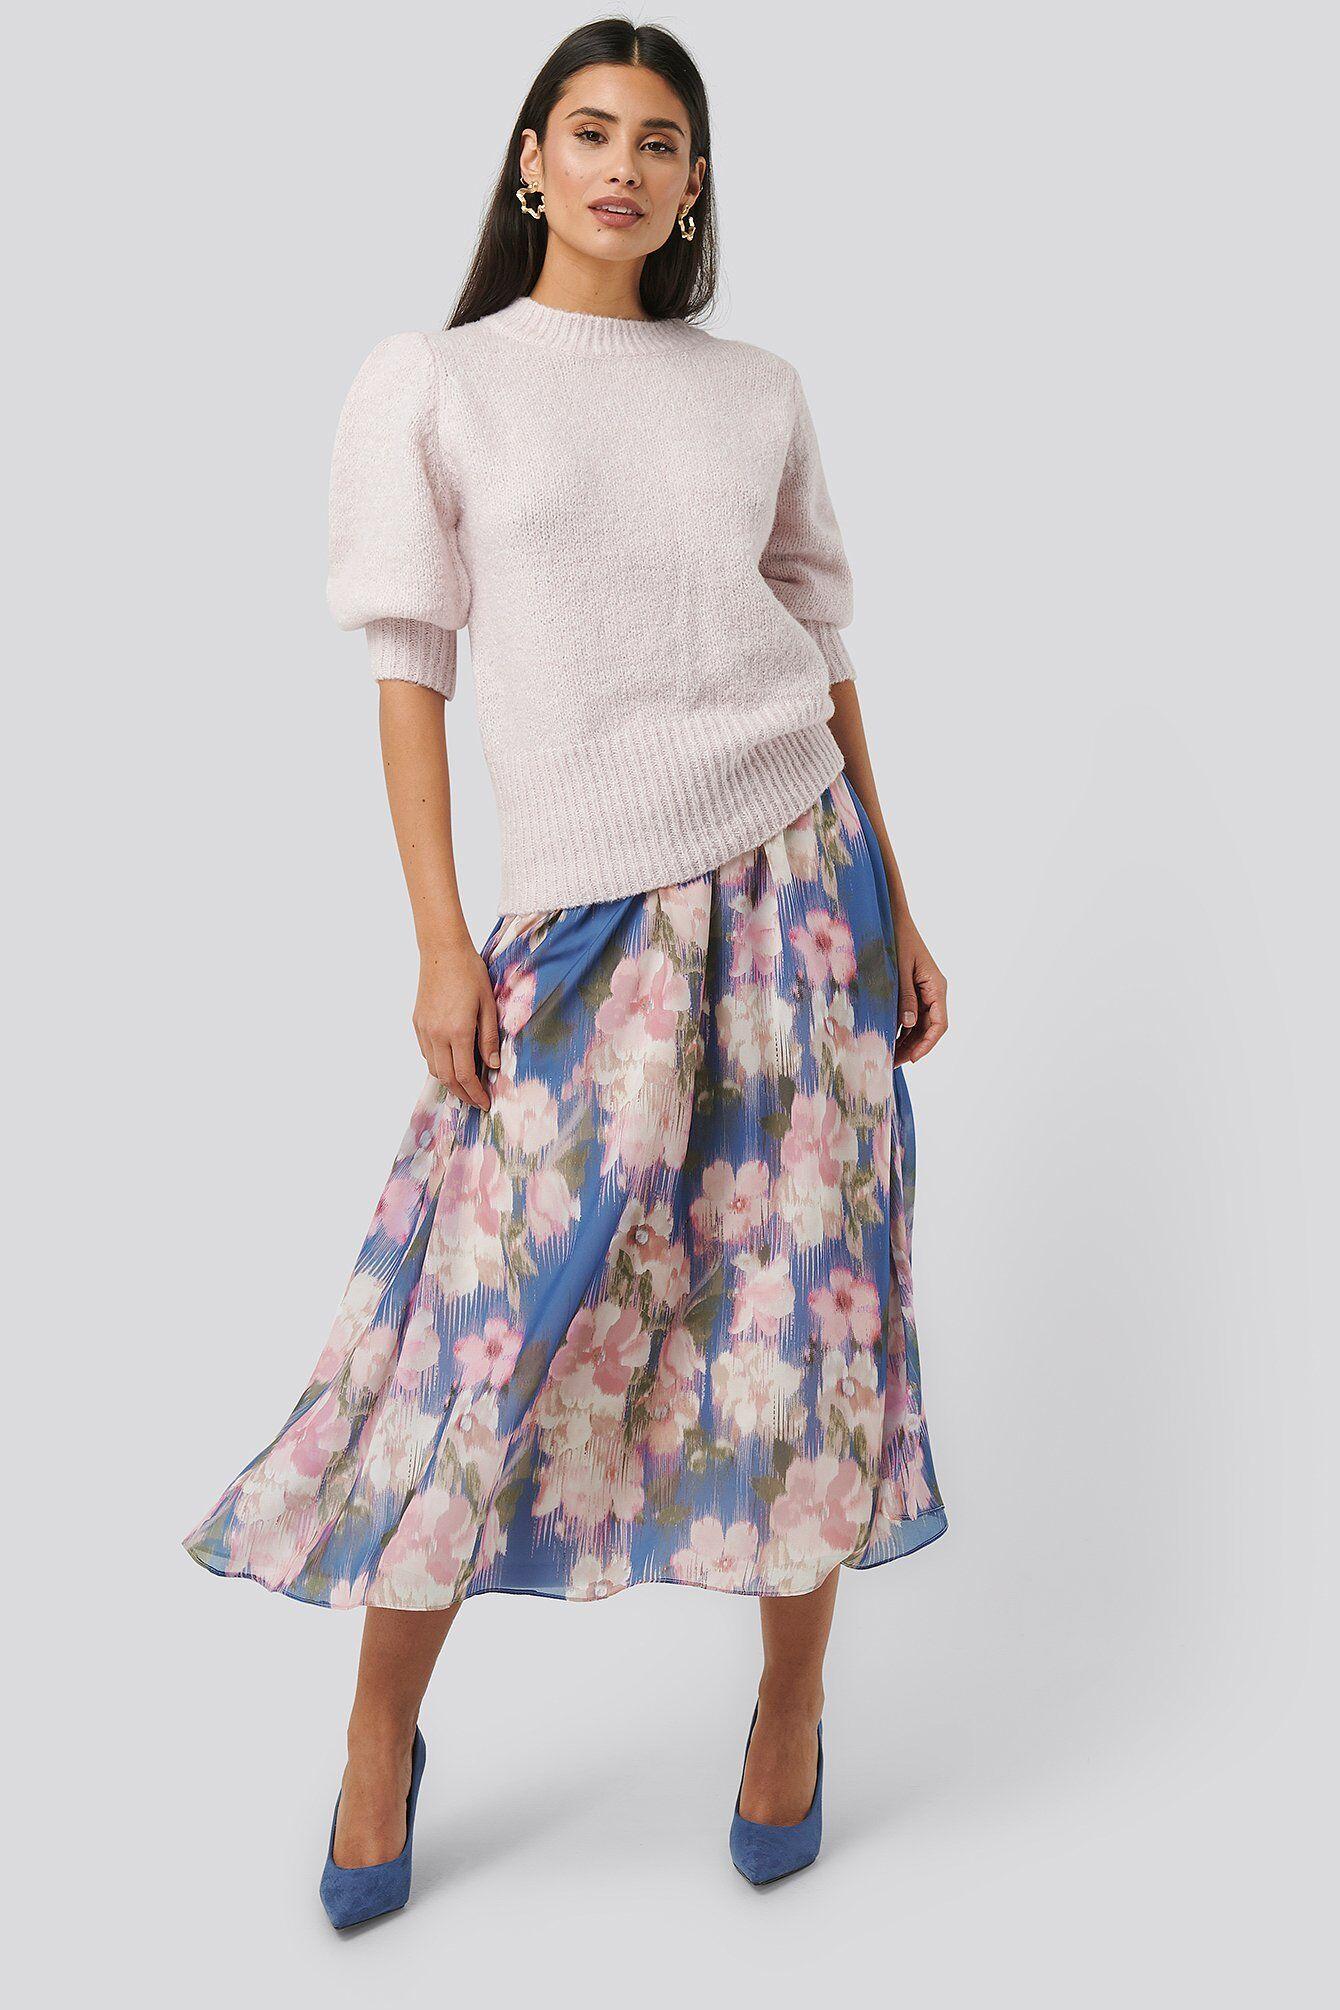 Image of NA-KD Flowy Chiffon Skirt - Multicolor